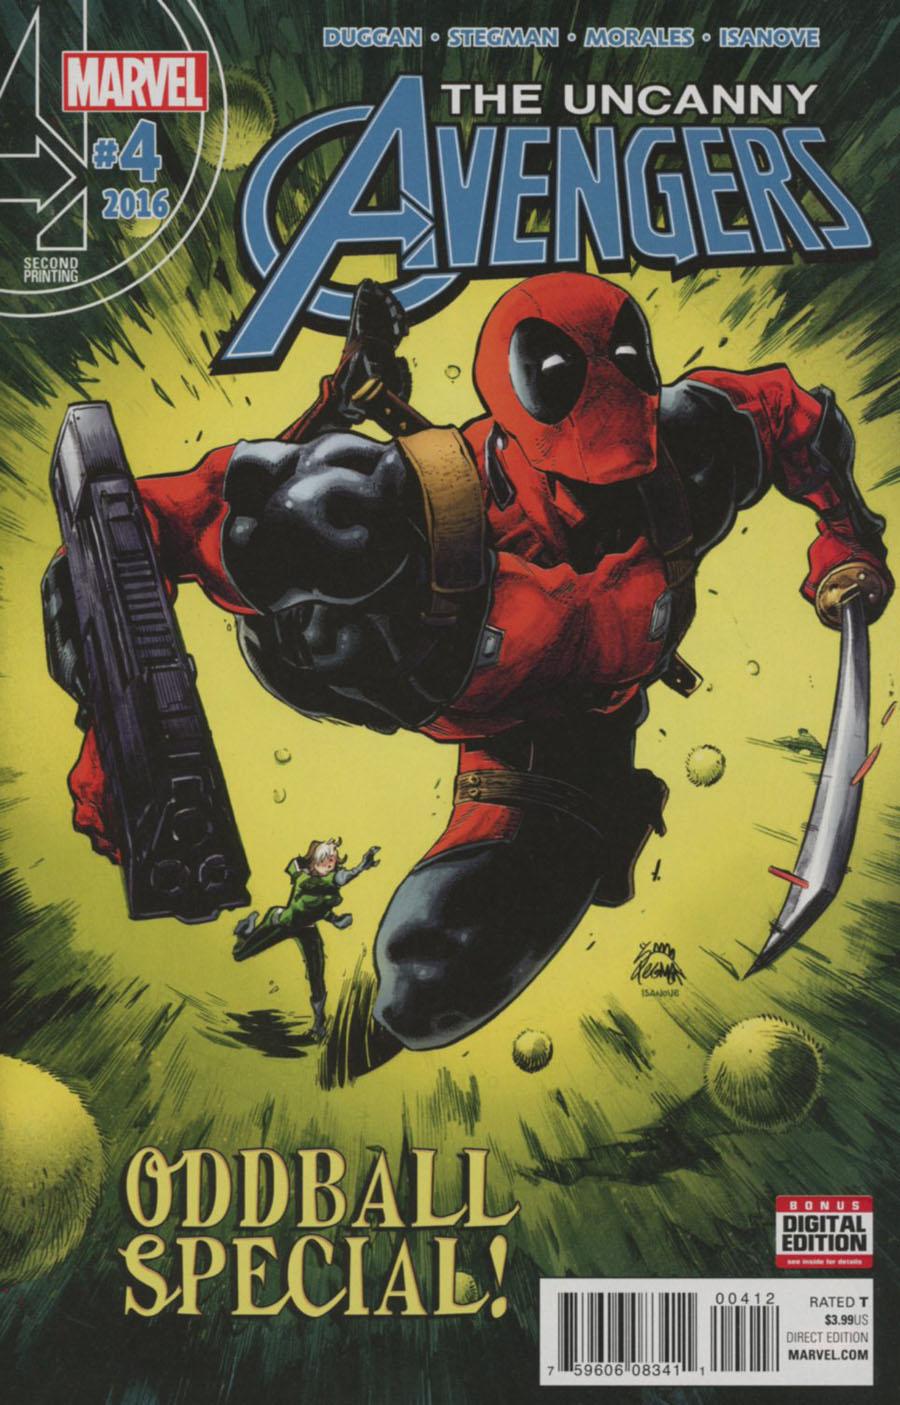 Uncanny Avengers Vol 3 #4 Cover C 2nd Ptg Ryan Stegman Variant Cover